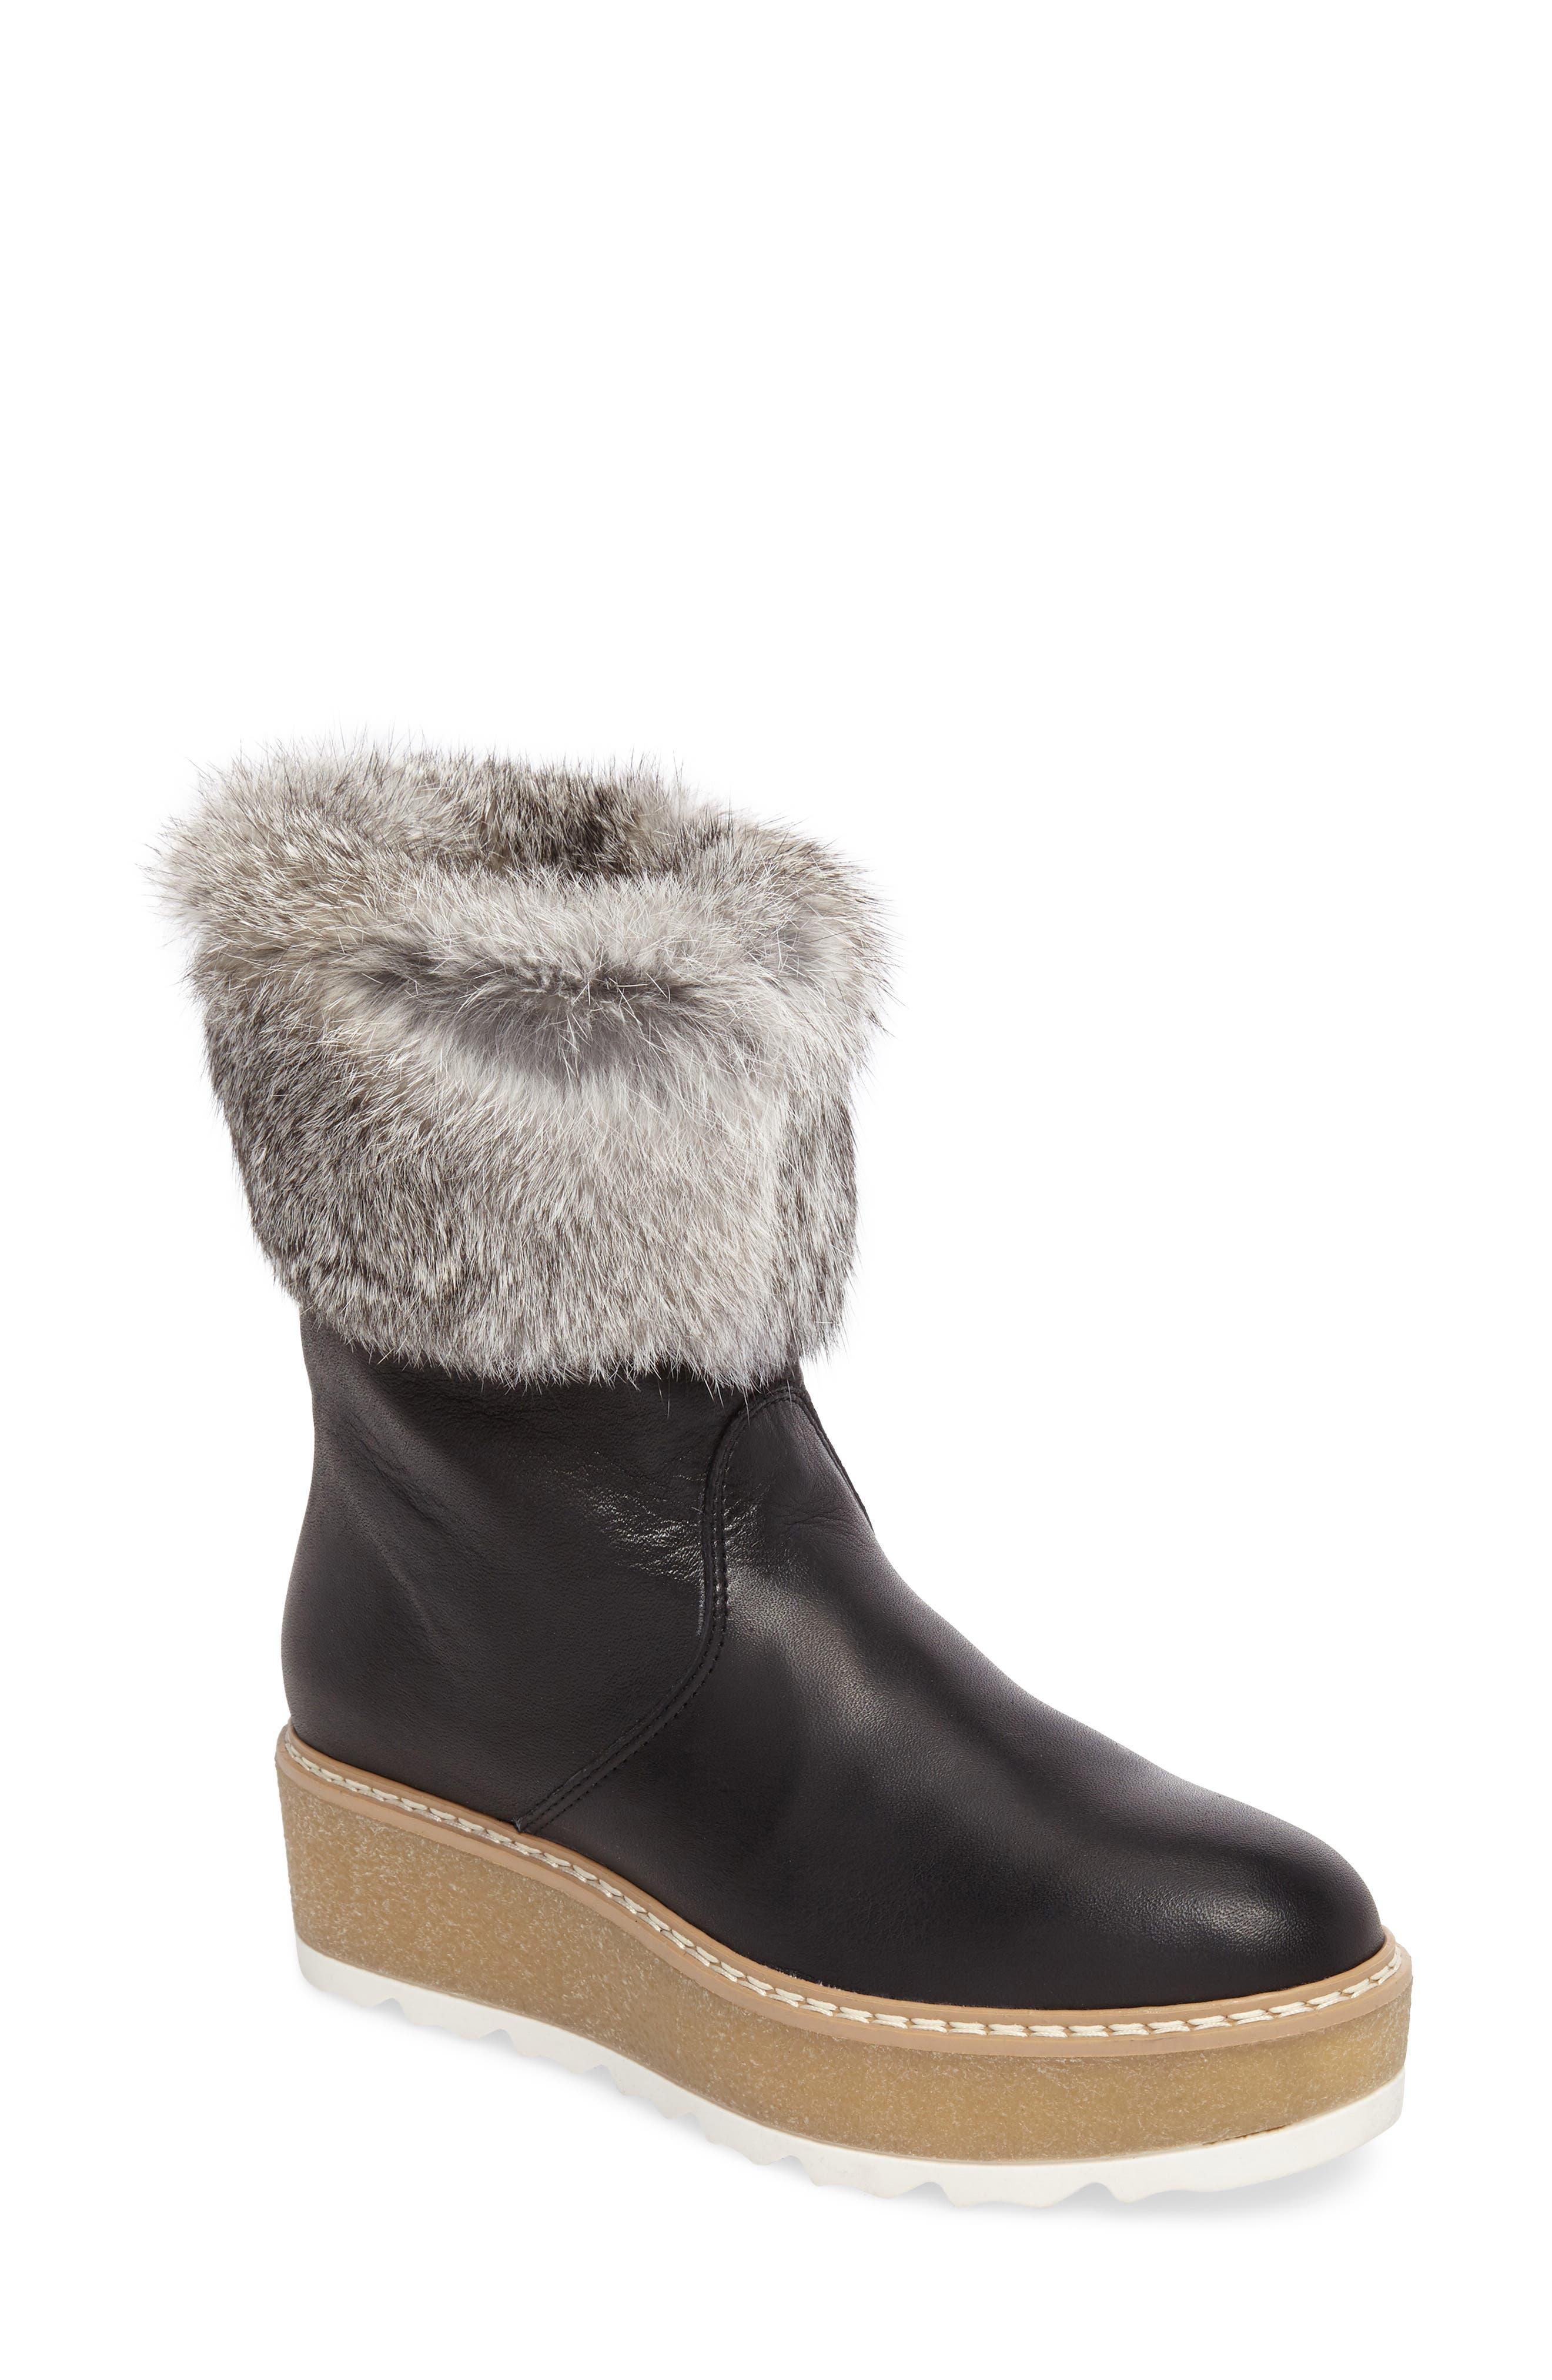 Rudsak Treasure Genuine Rabbit Fur Trim Winter Boot (Women)